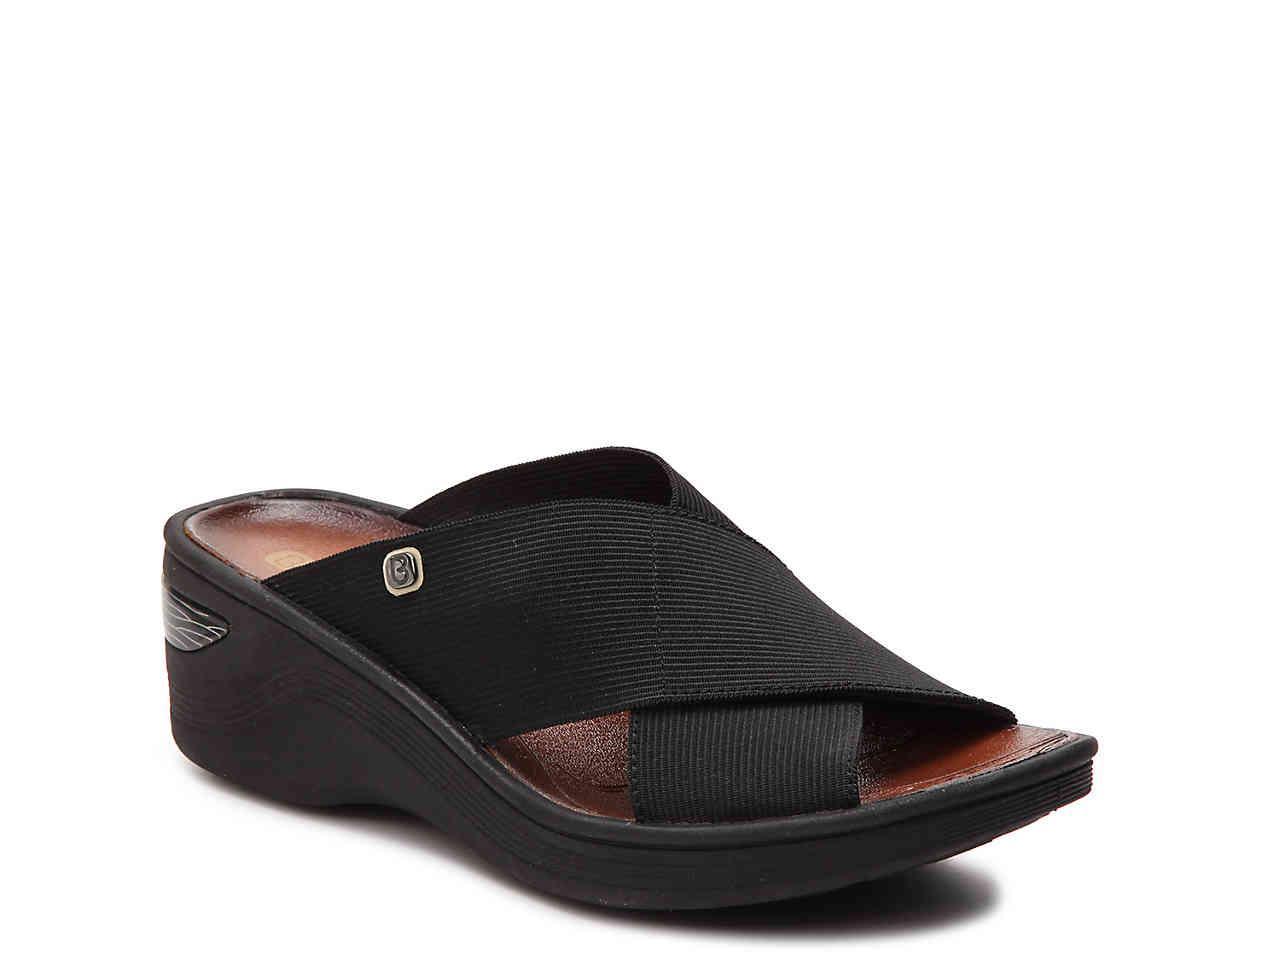 de5bd23f8cd Lyst - Bzees Desire Wedge Sandal in Black - Save 25%